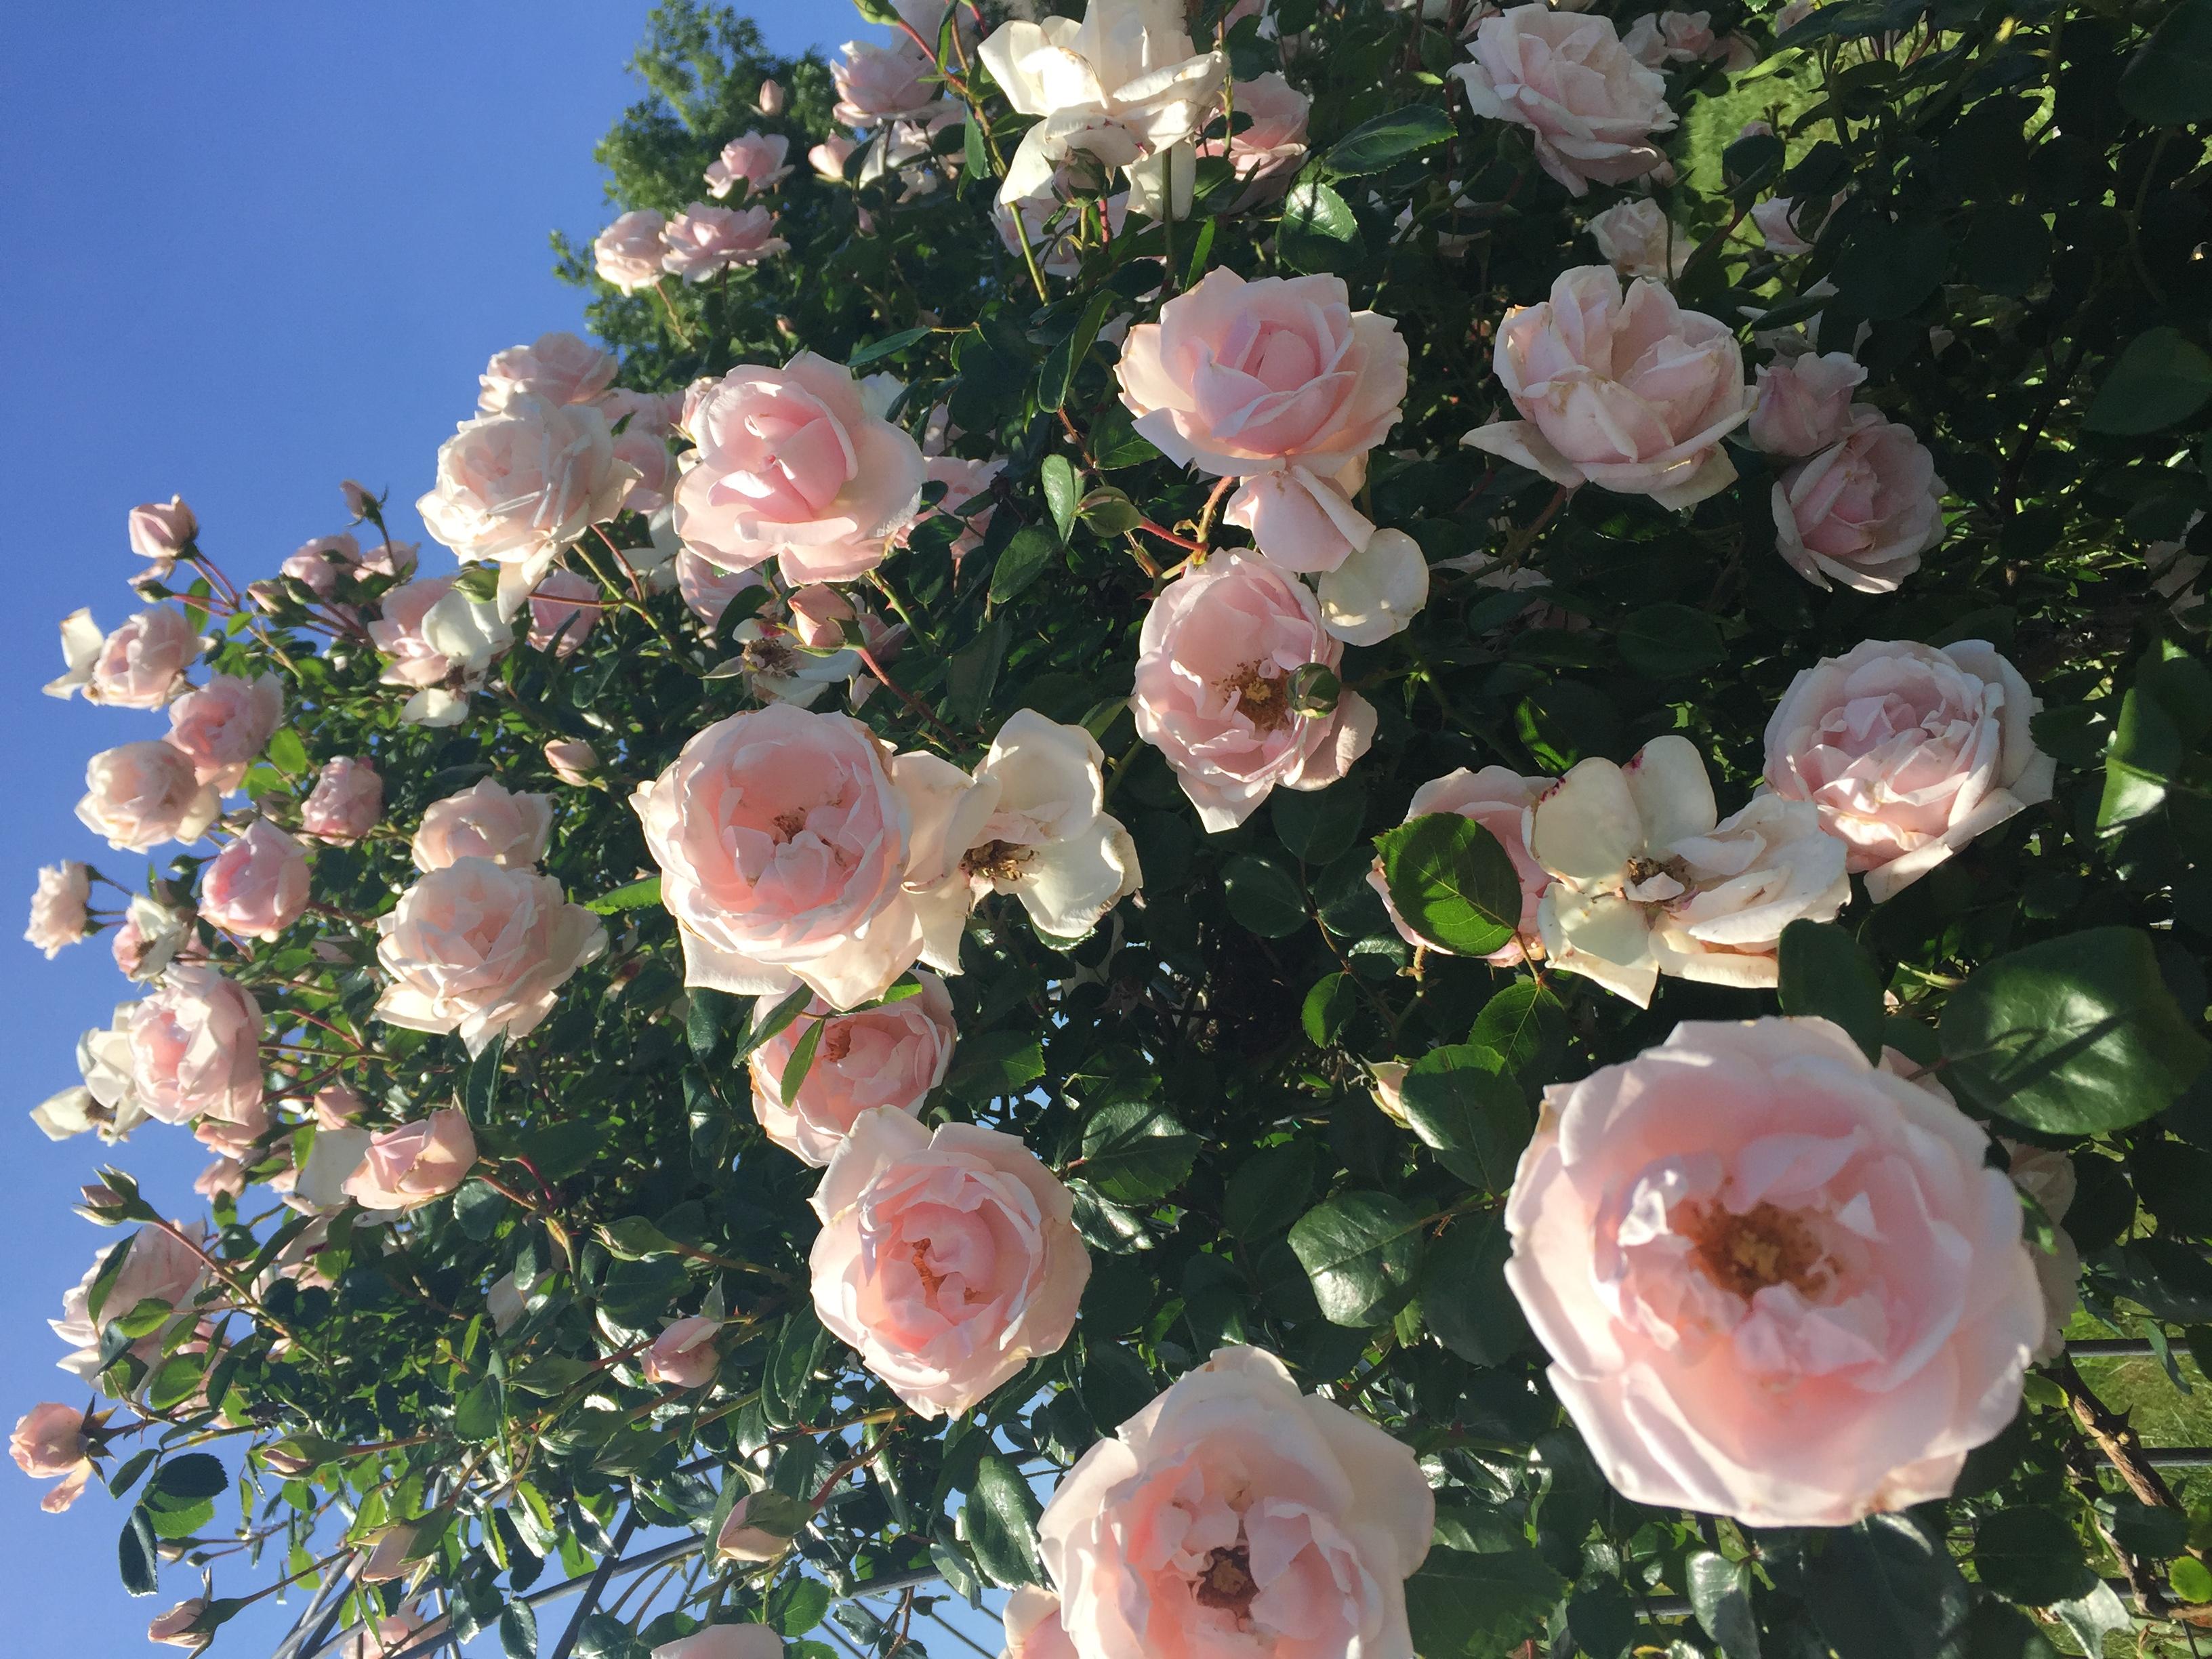 BC1565CF 0FAE 47FF AA30 579B8E632D0D Roses in full bloom!